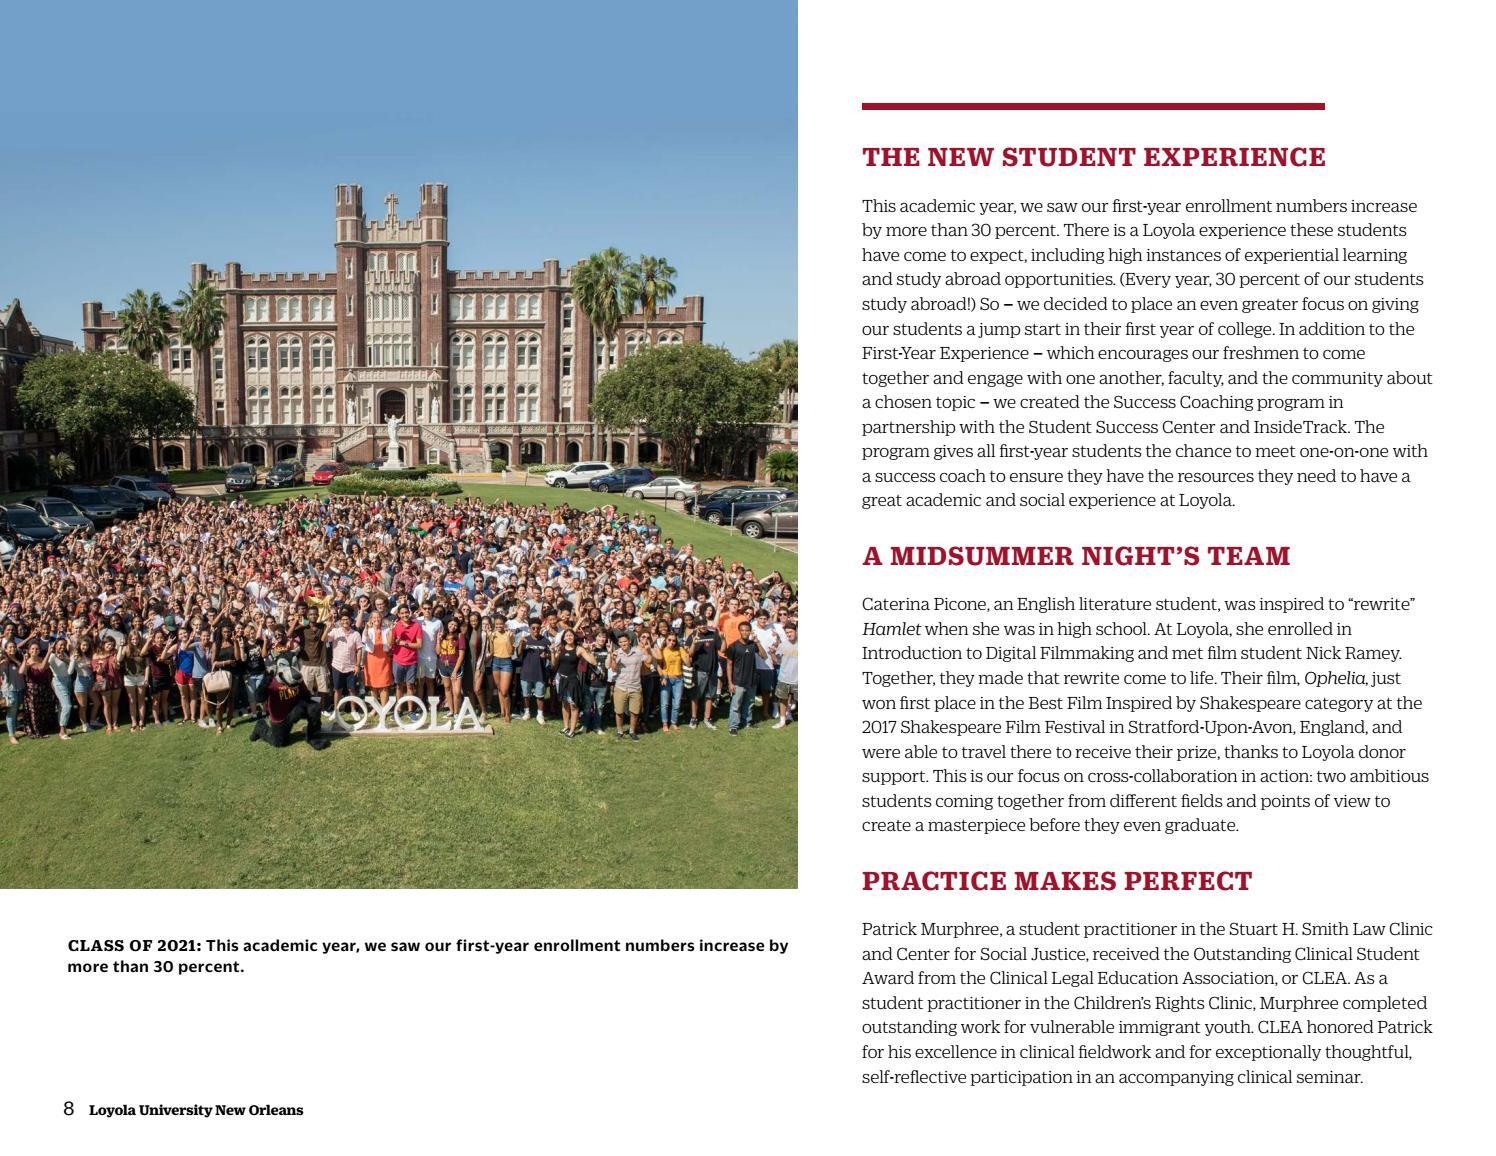 WINNING 2017—More in Deeds: Loyola University New Orleans